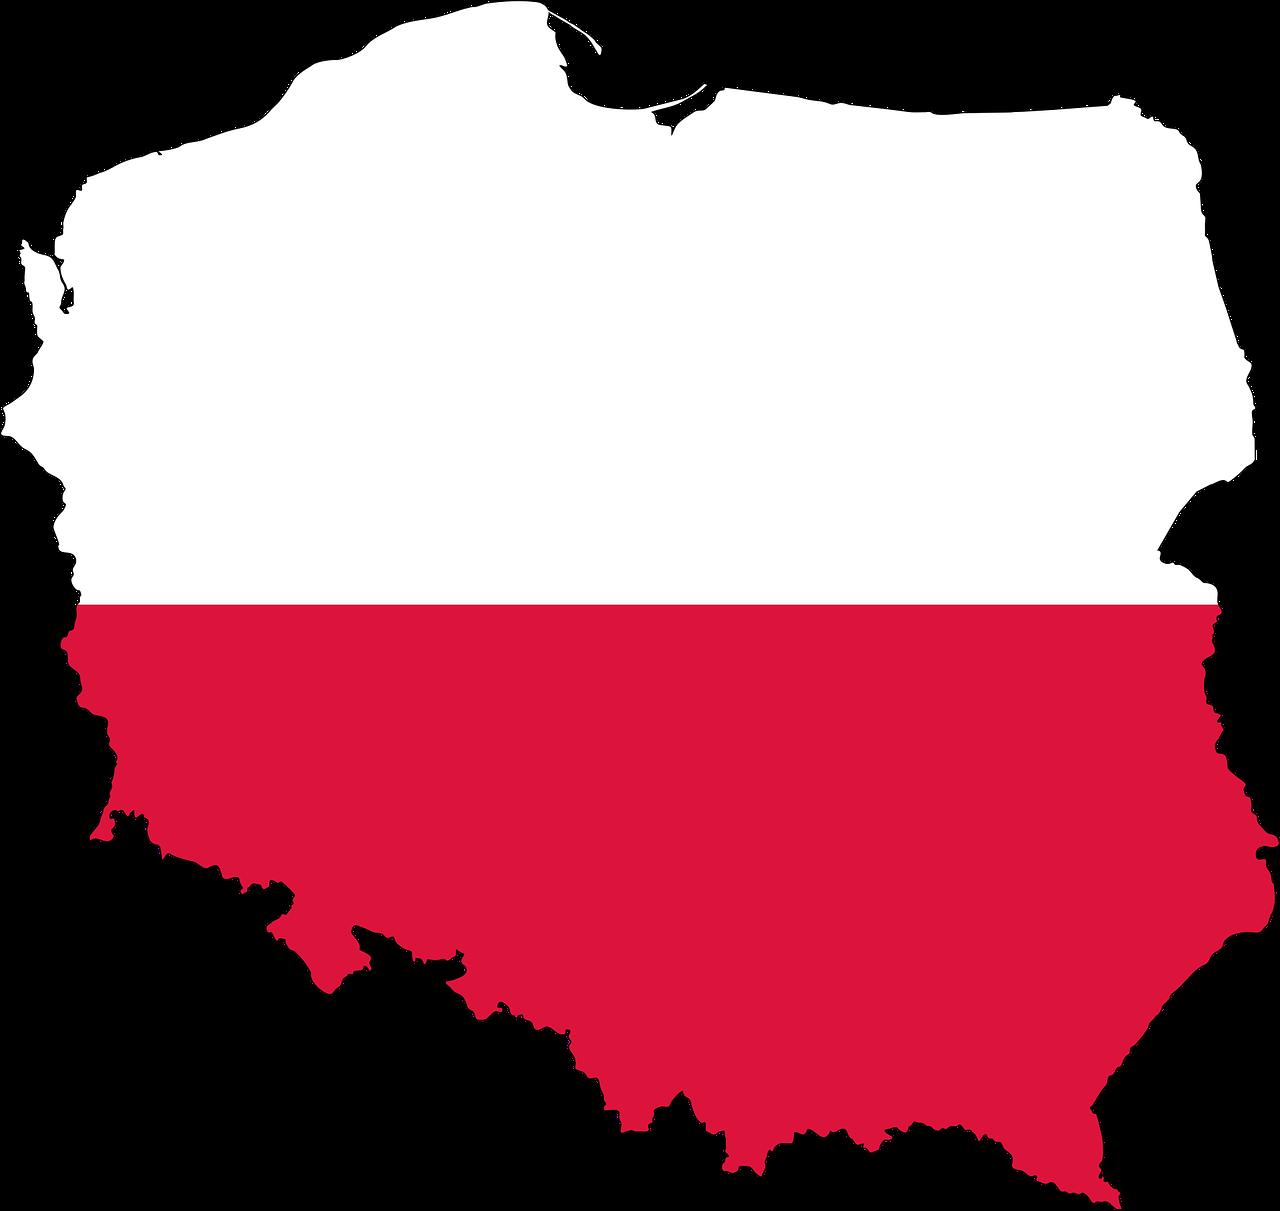 Blog o języku angielskim - nauka angielskiego online - Poland and Polish people